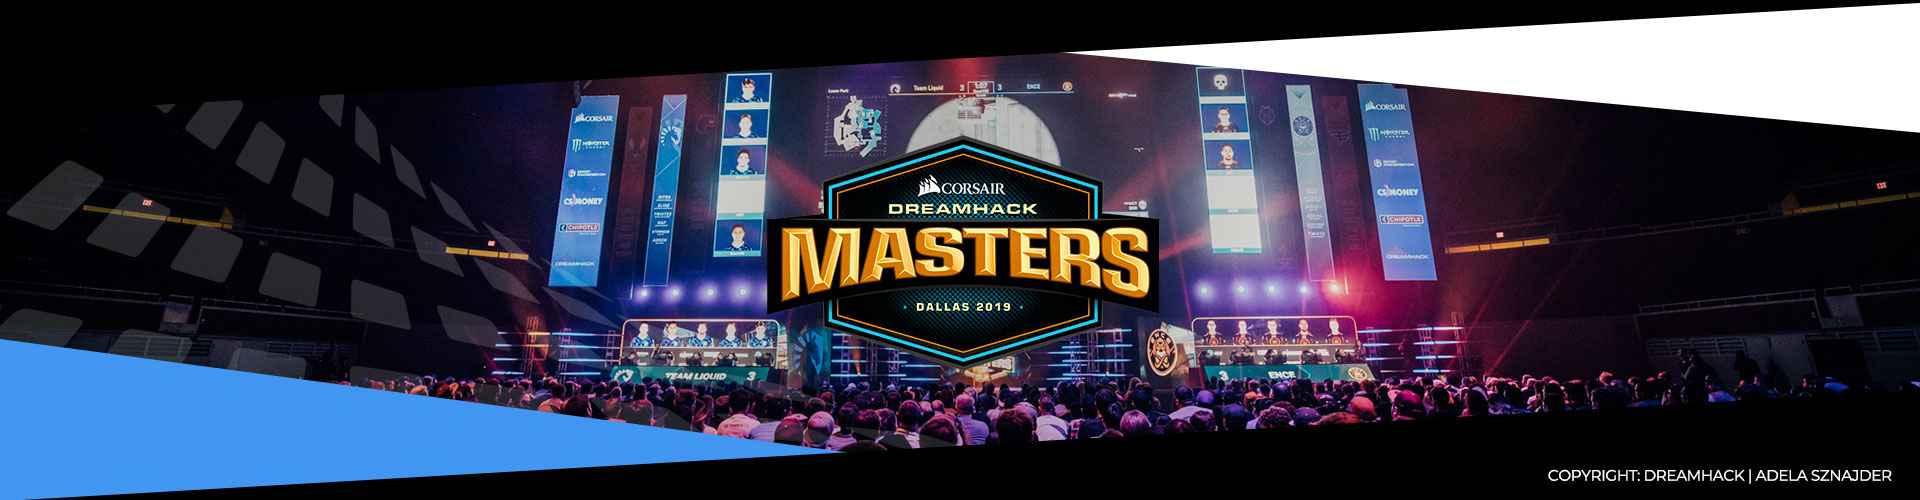 CS:GO - Dreamhack Masters Dallas